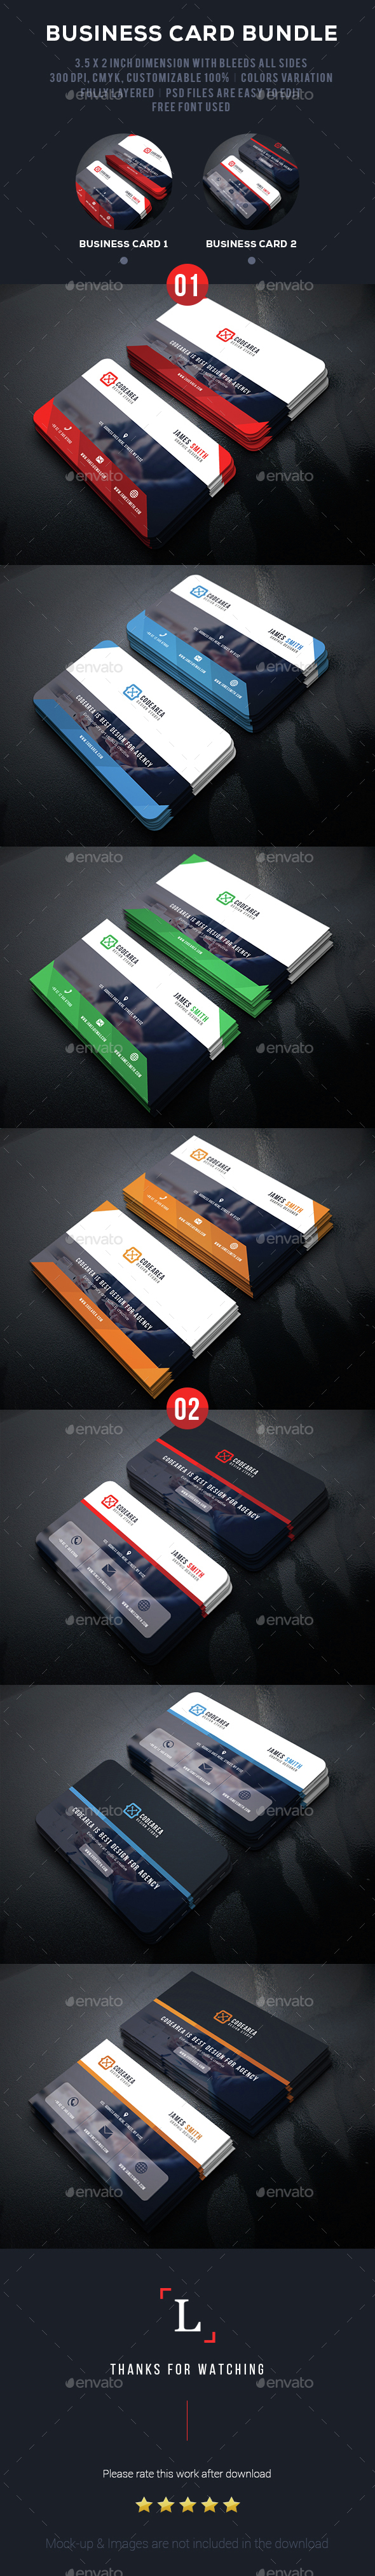 Soft Business Card Bundle - Business Cards Print Templates